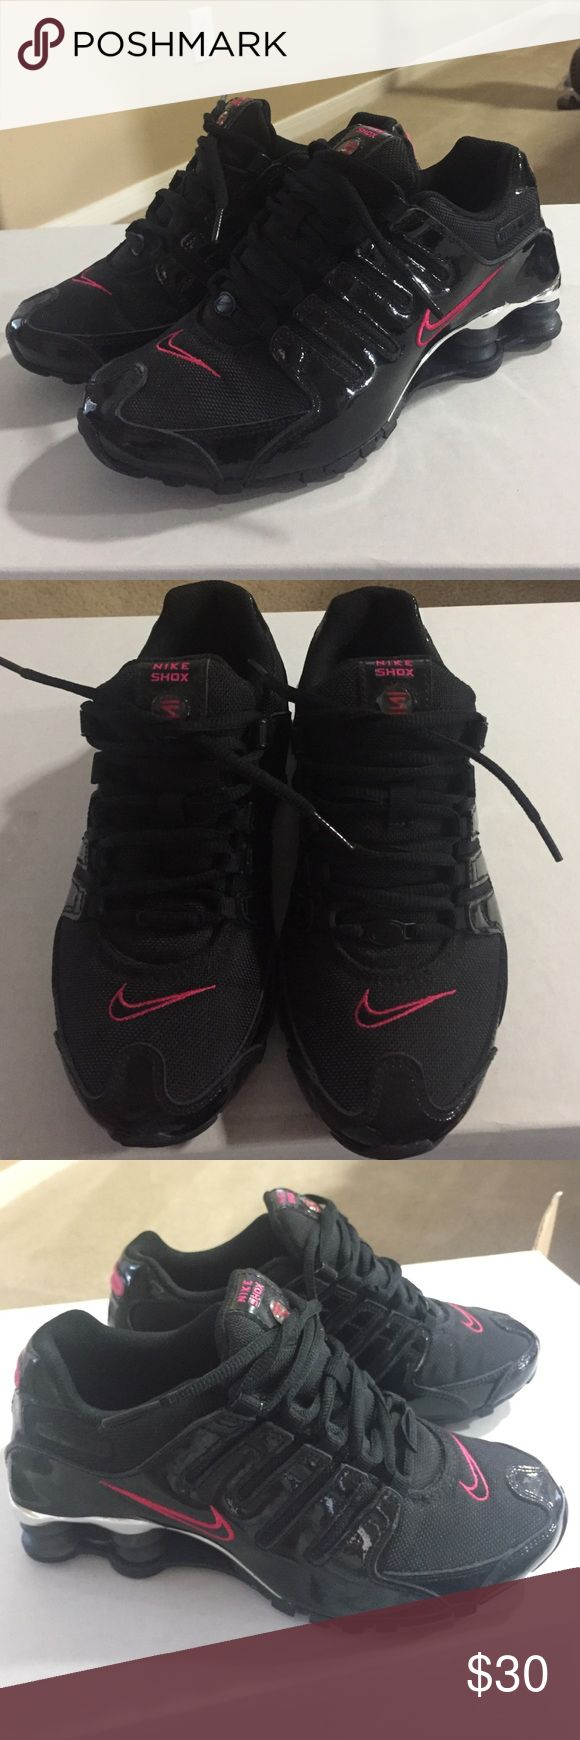 online retailer fc551 d5790 ... Top Nike Shox for Kids